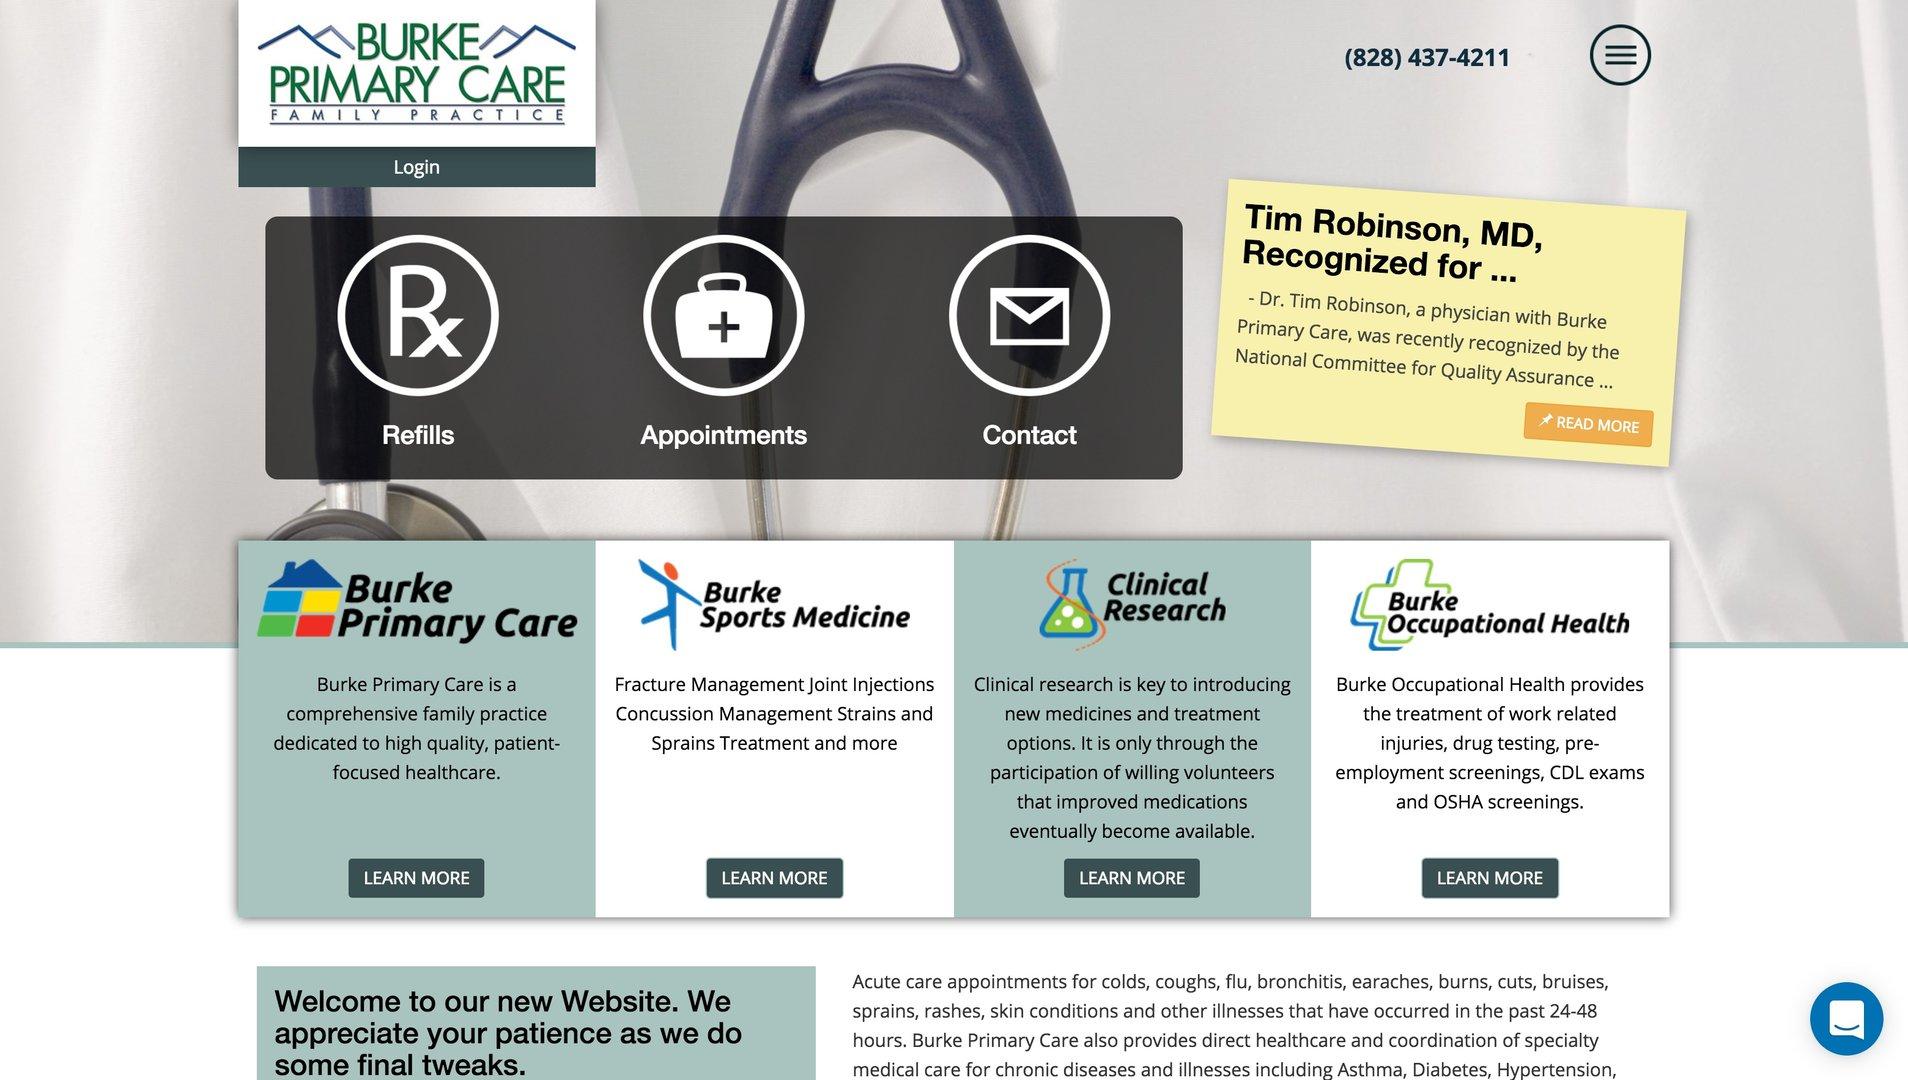 Burke Primary Care website homepage